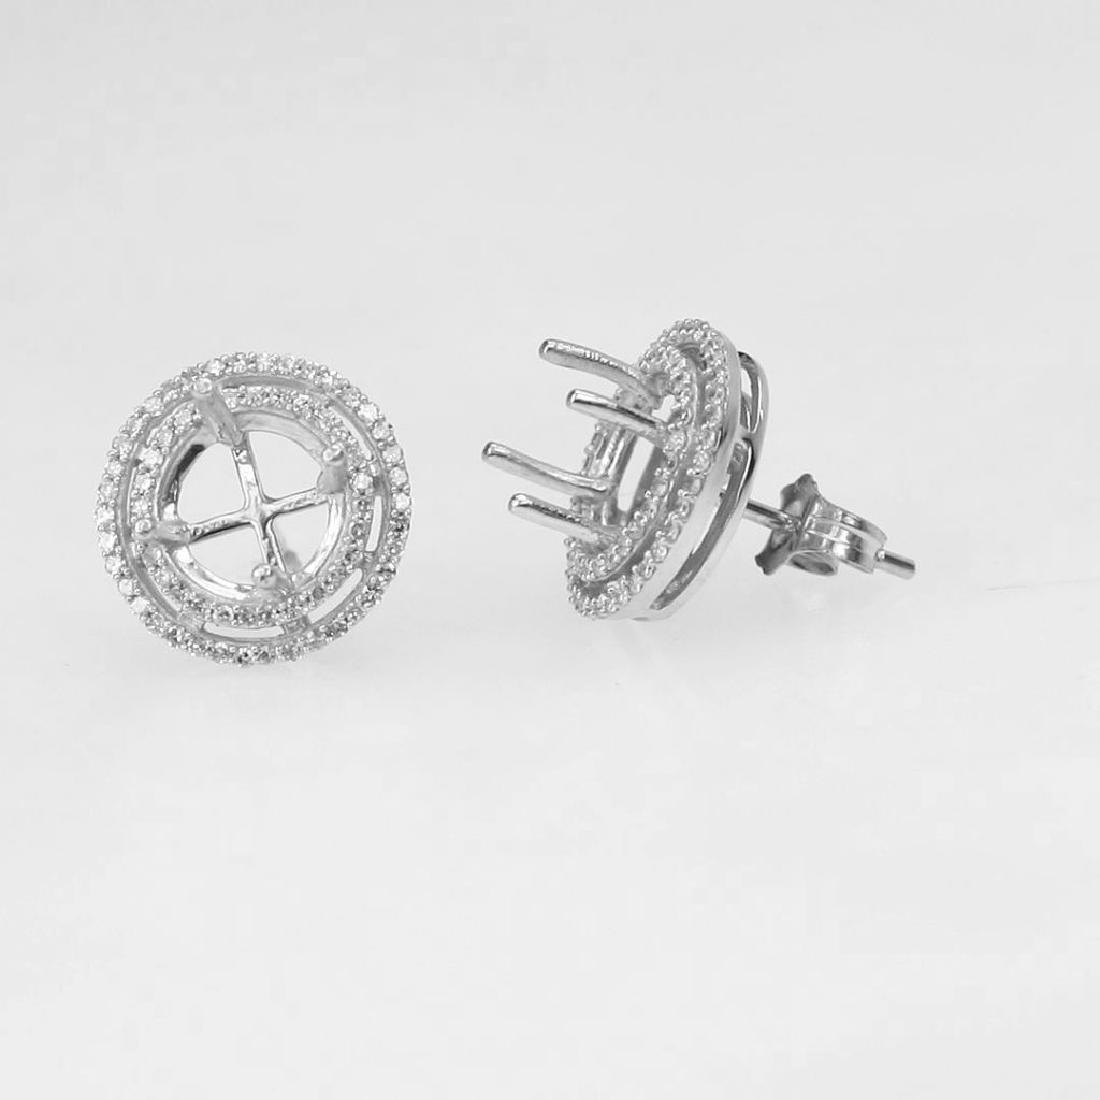 14K White Gold 0.39CTW Diamond Semi-Mount Earrings